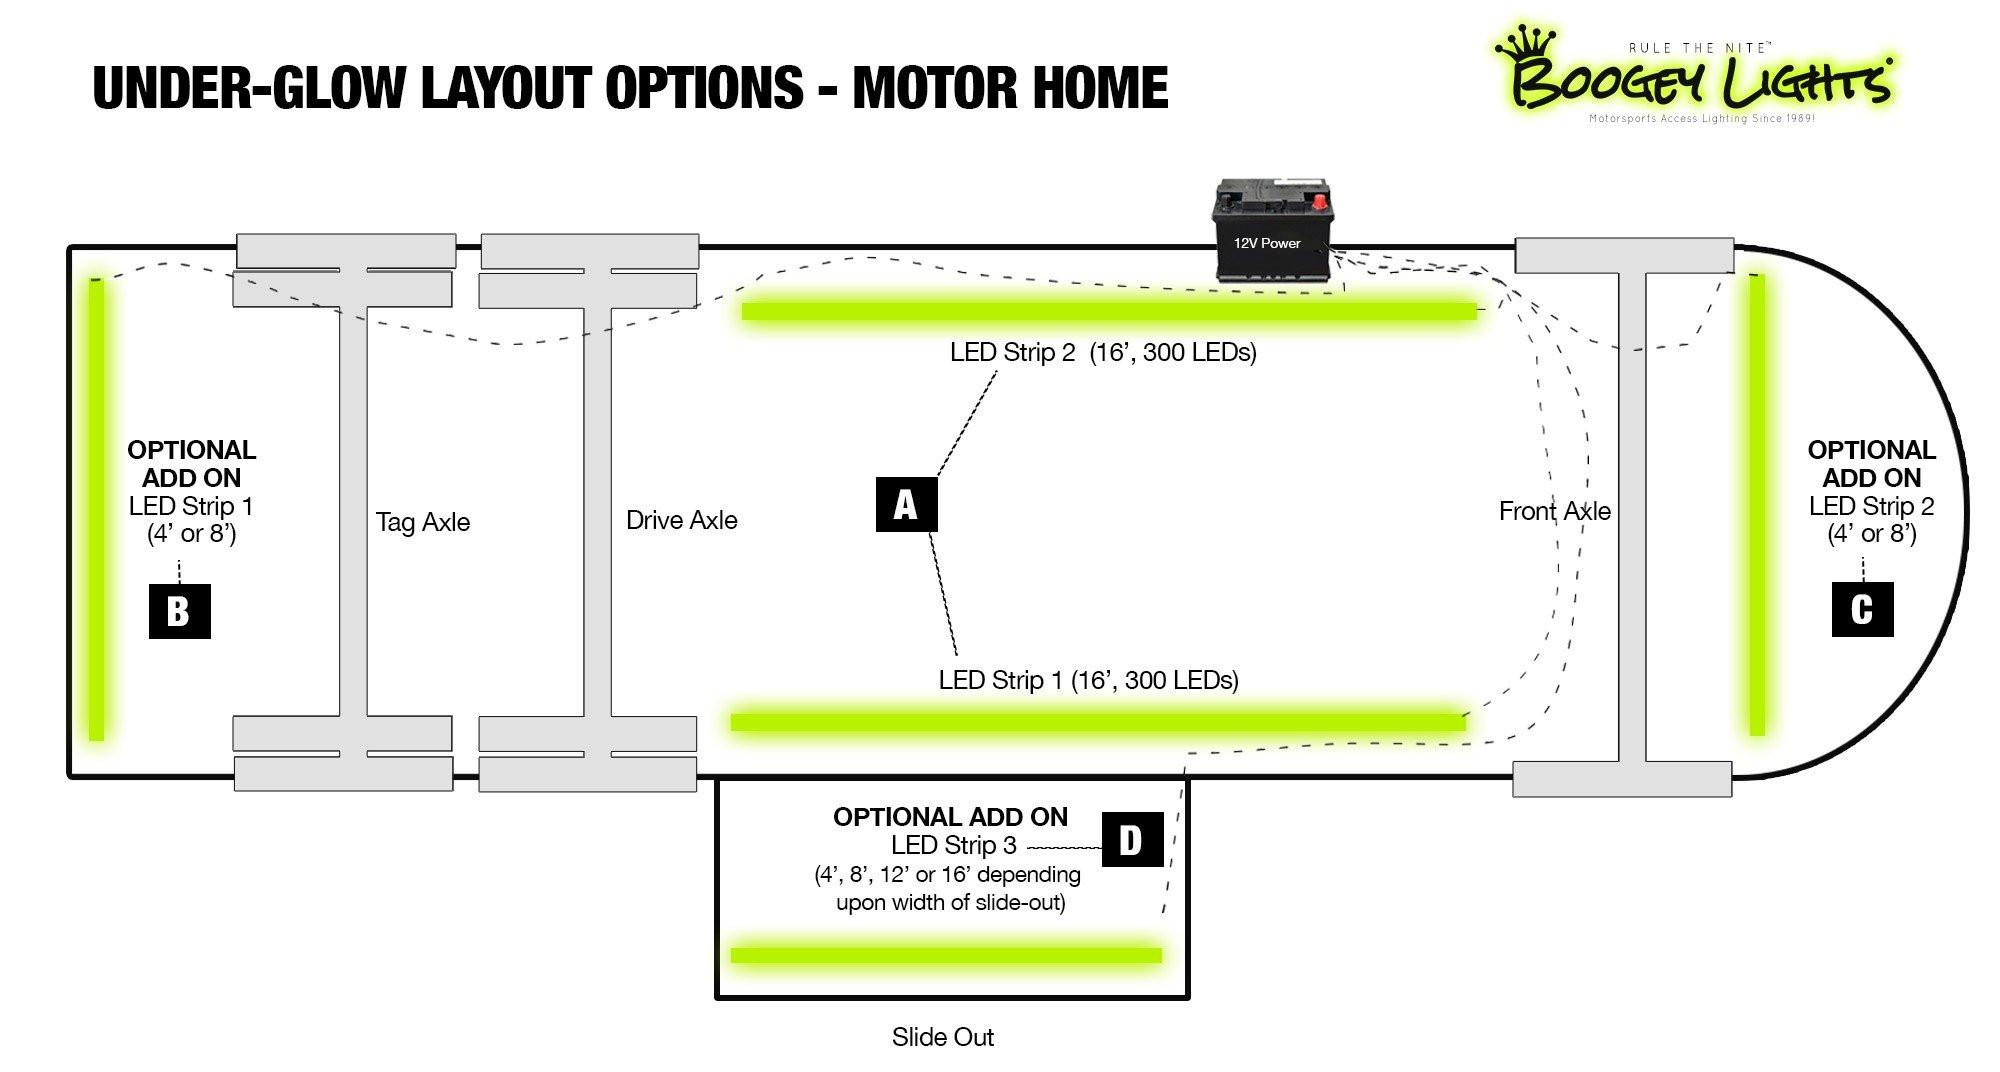 Led Trailer Lights Wiring Diagram Boat | Wiring Diagram - Boat Trailer Lights Wiring Diagram